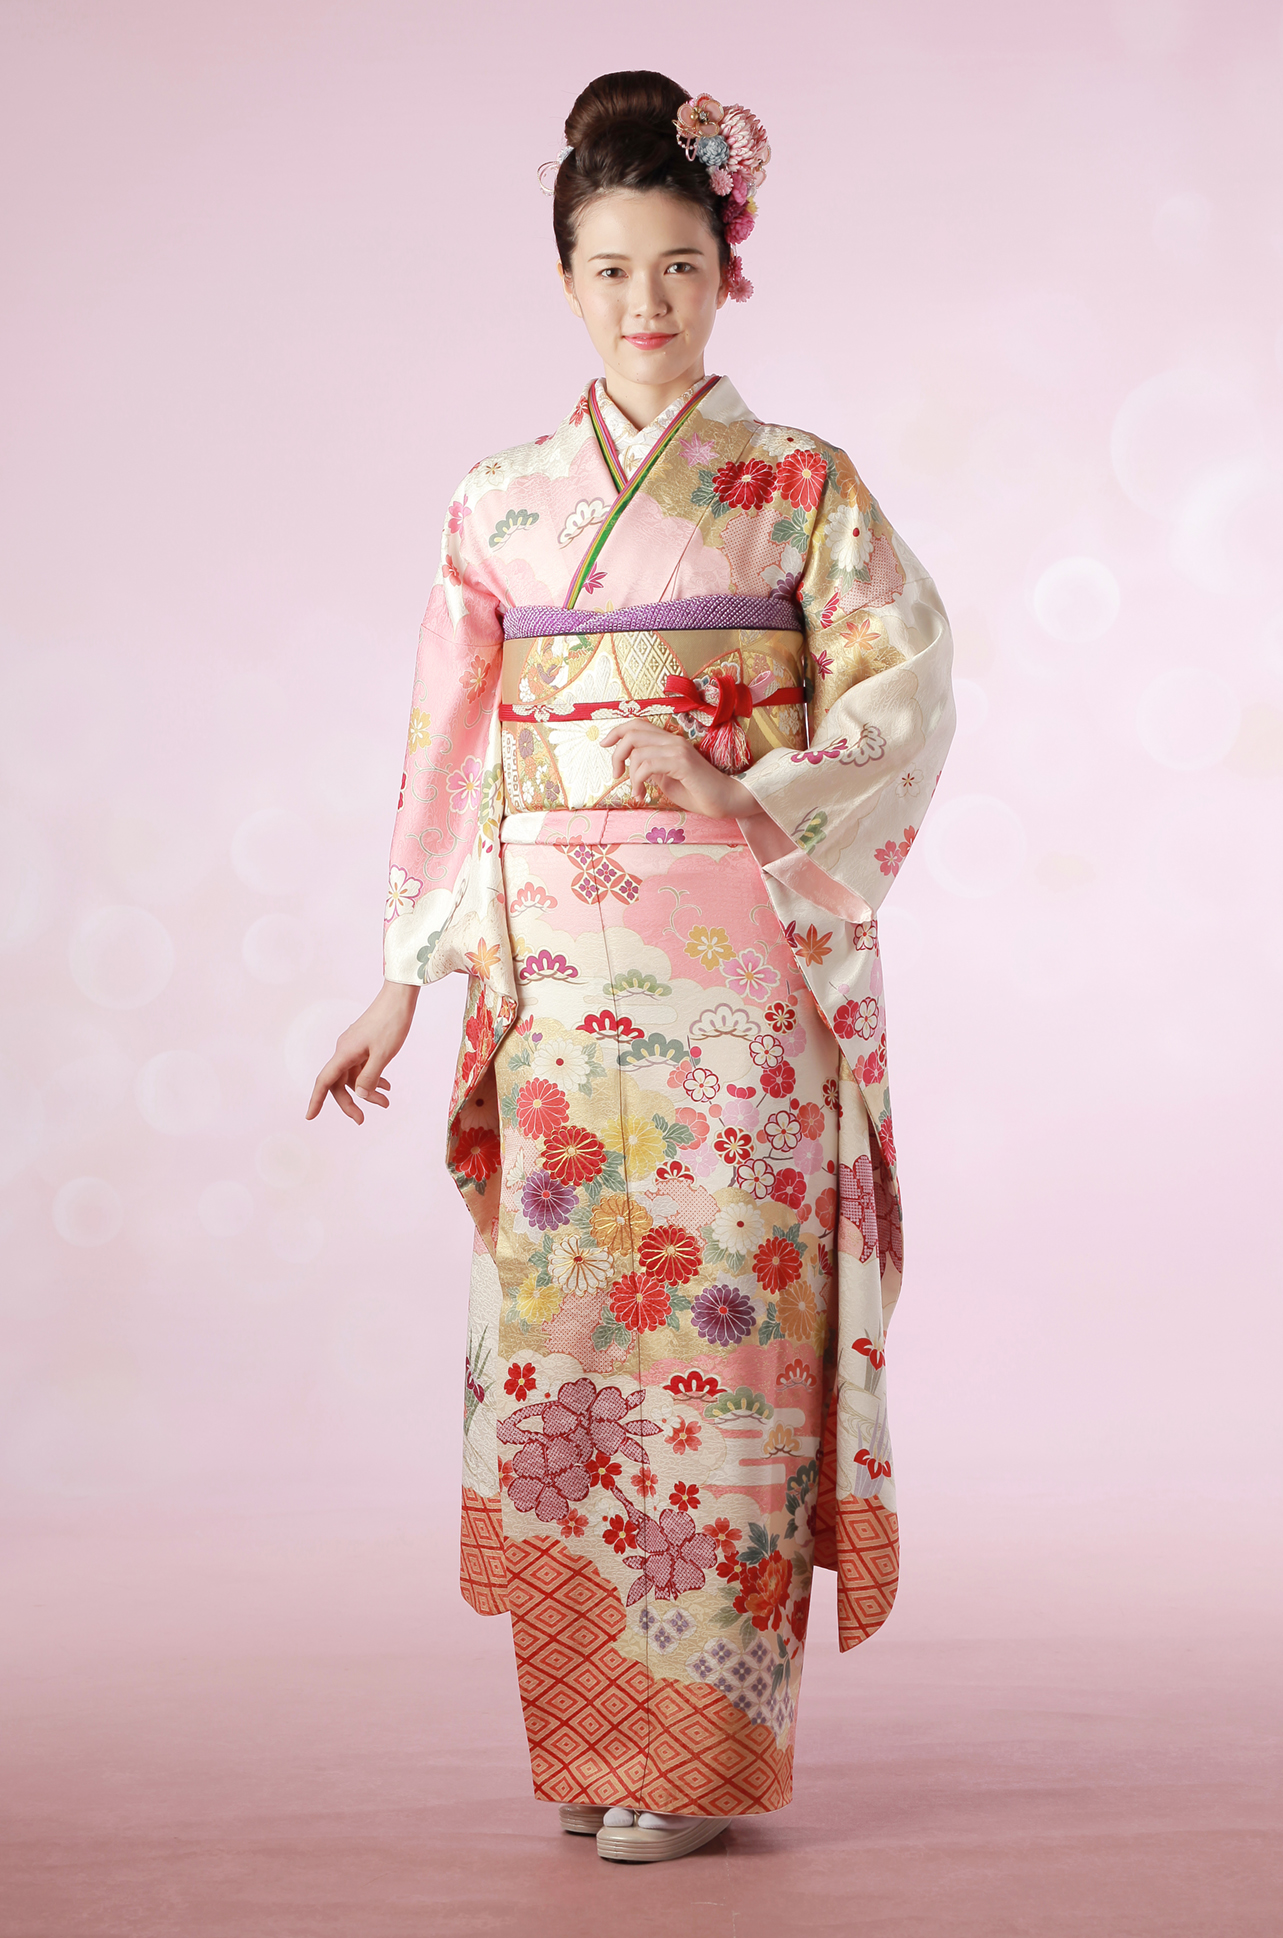 【No.MKK-023】★ ピンクの雲取り地にはんなり雅な古典花文振袖